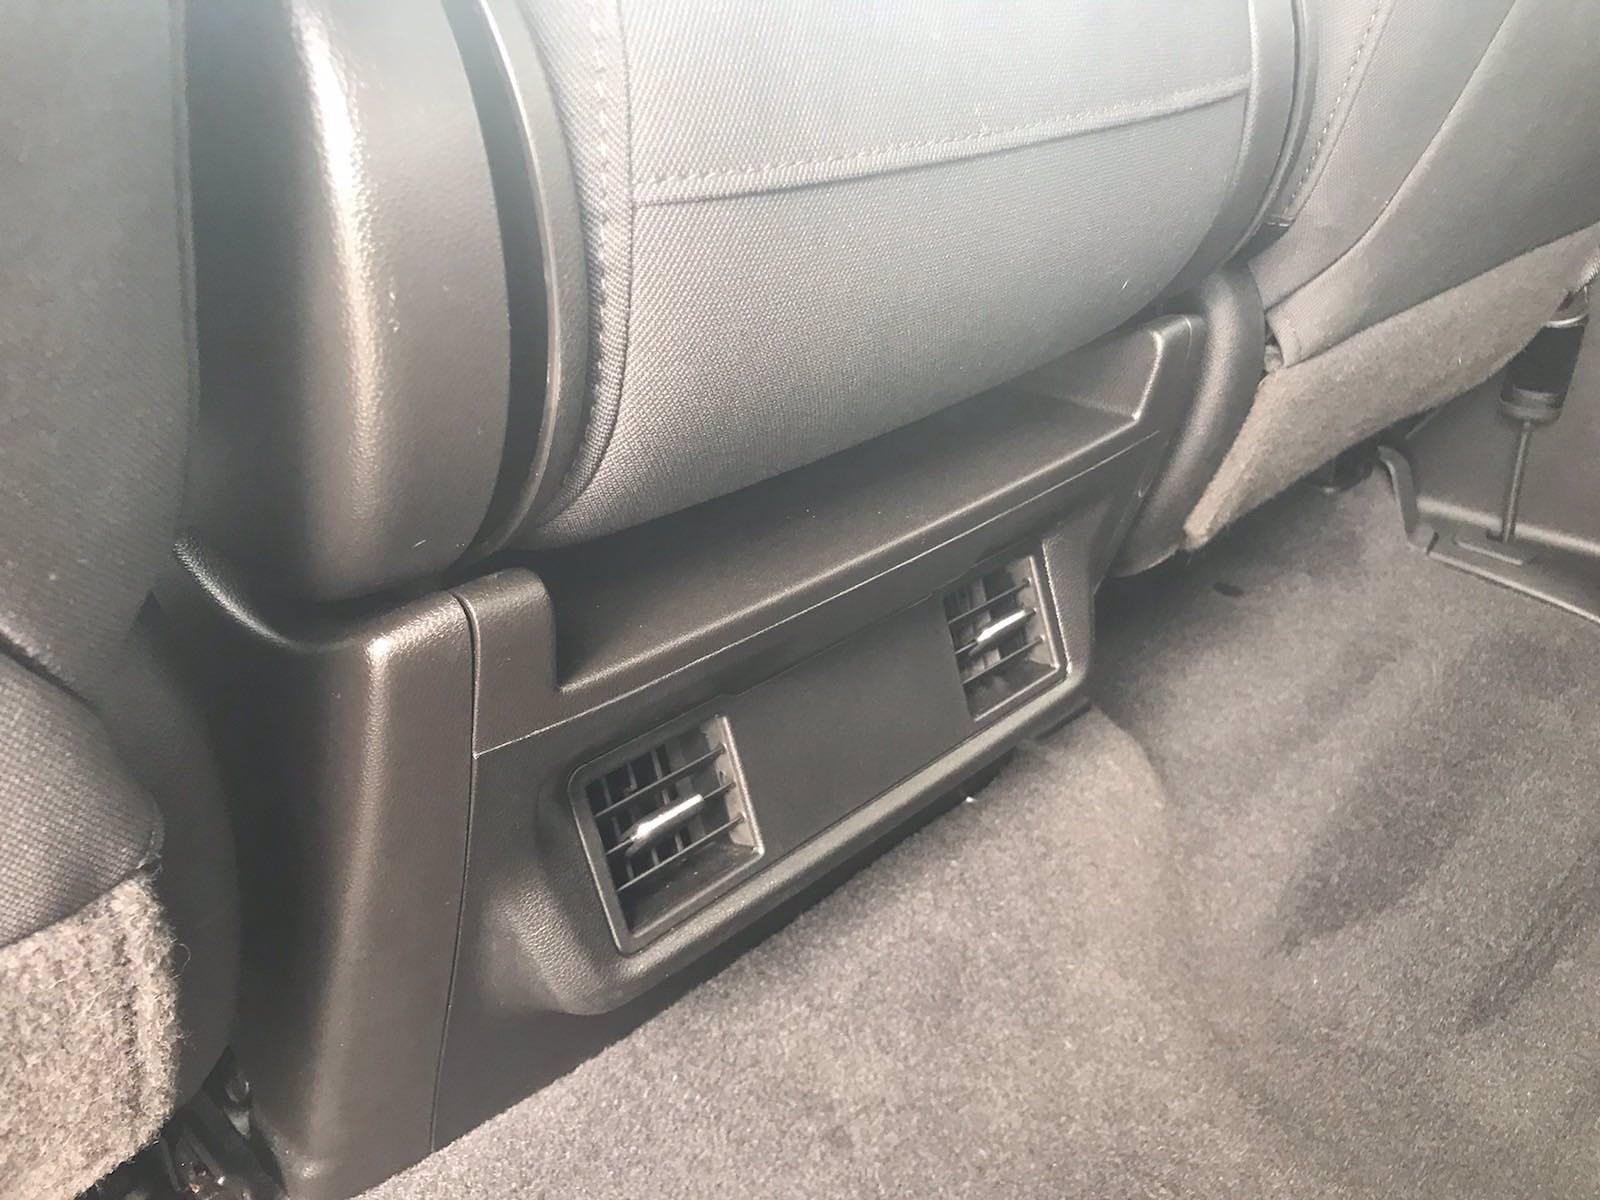 2020 Chevrolet Silverado 1500 Crew Cab 4x4, Pickup #16458PN - photo 44